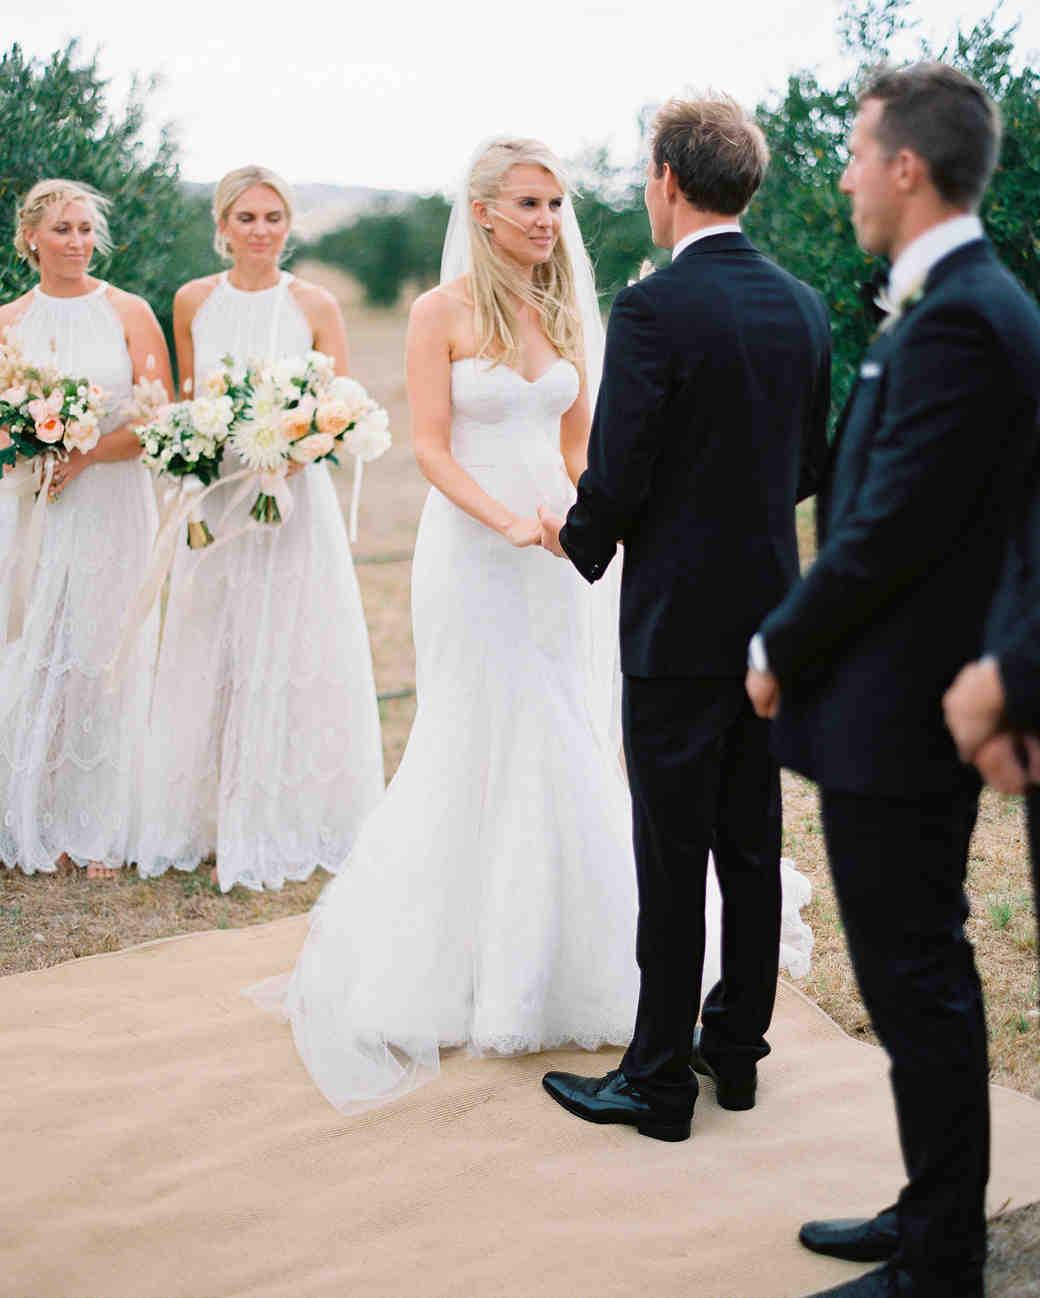 jemma-michael-wedding-ceremony-002590010-s112110-0815.jpg